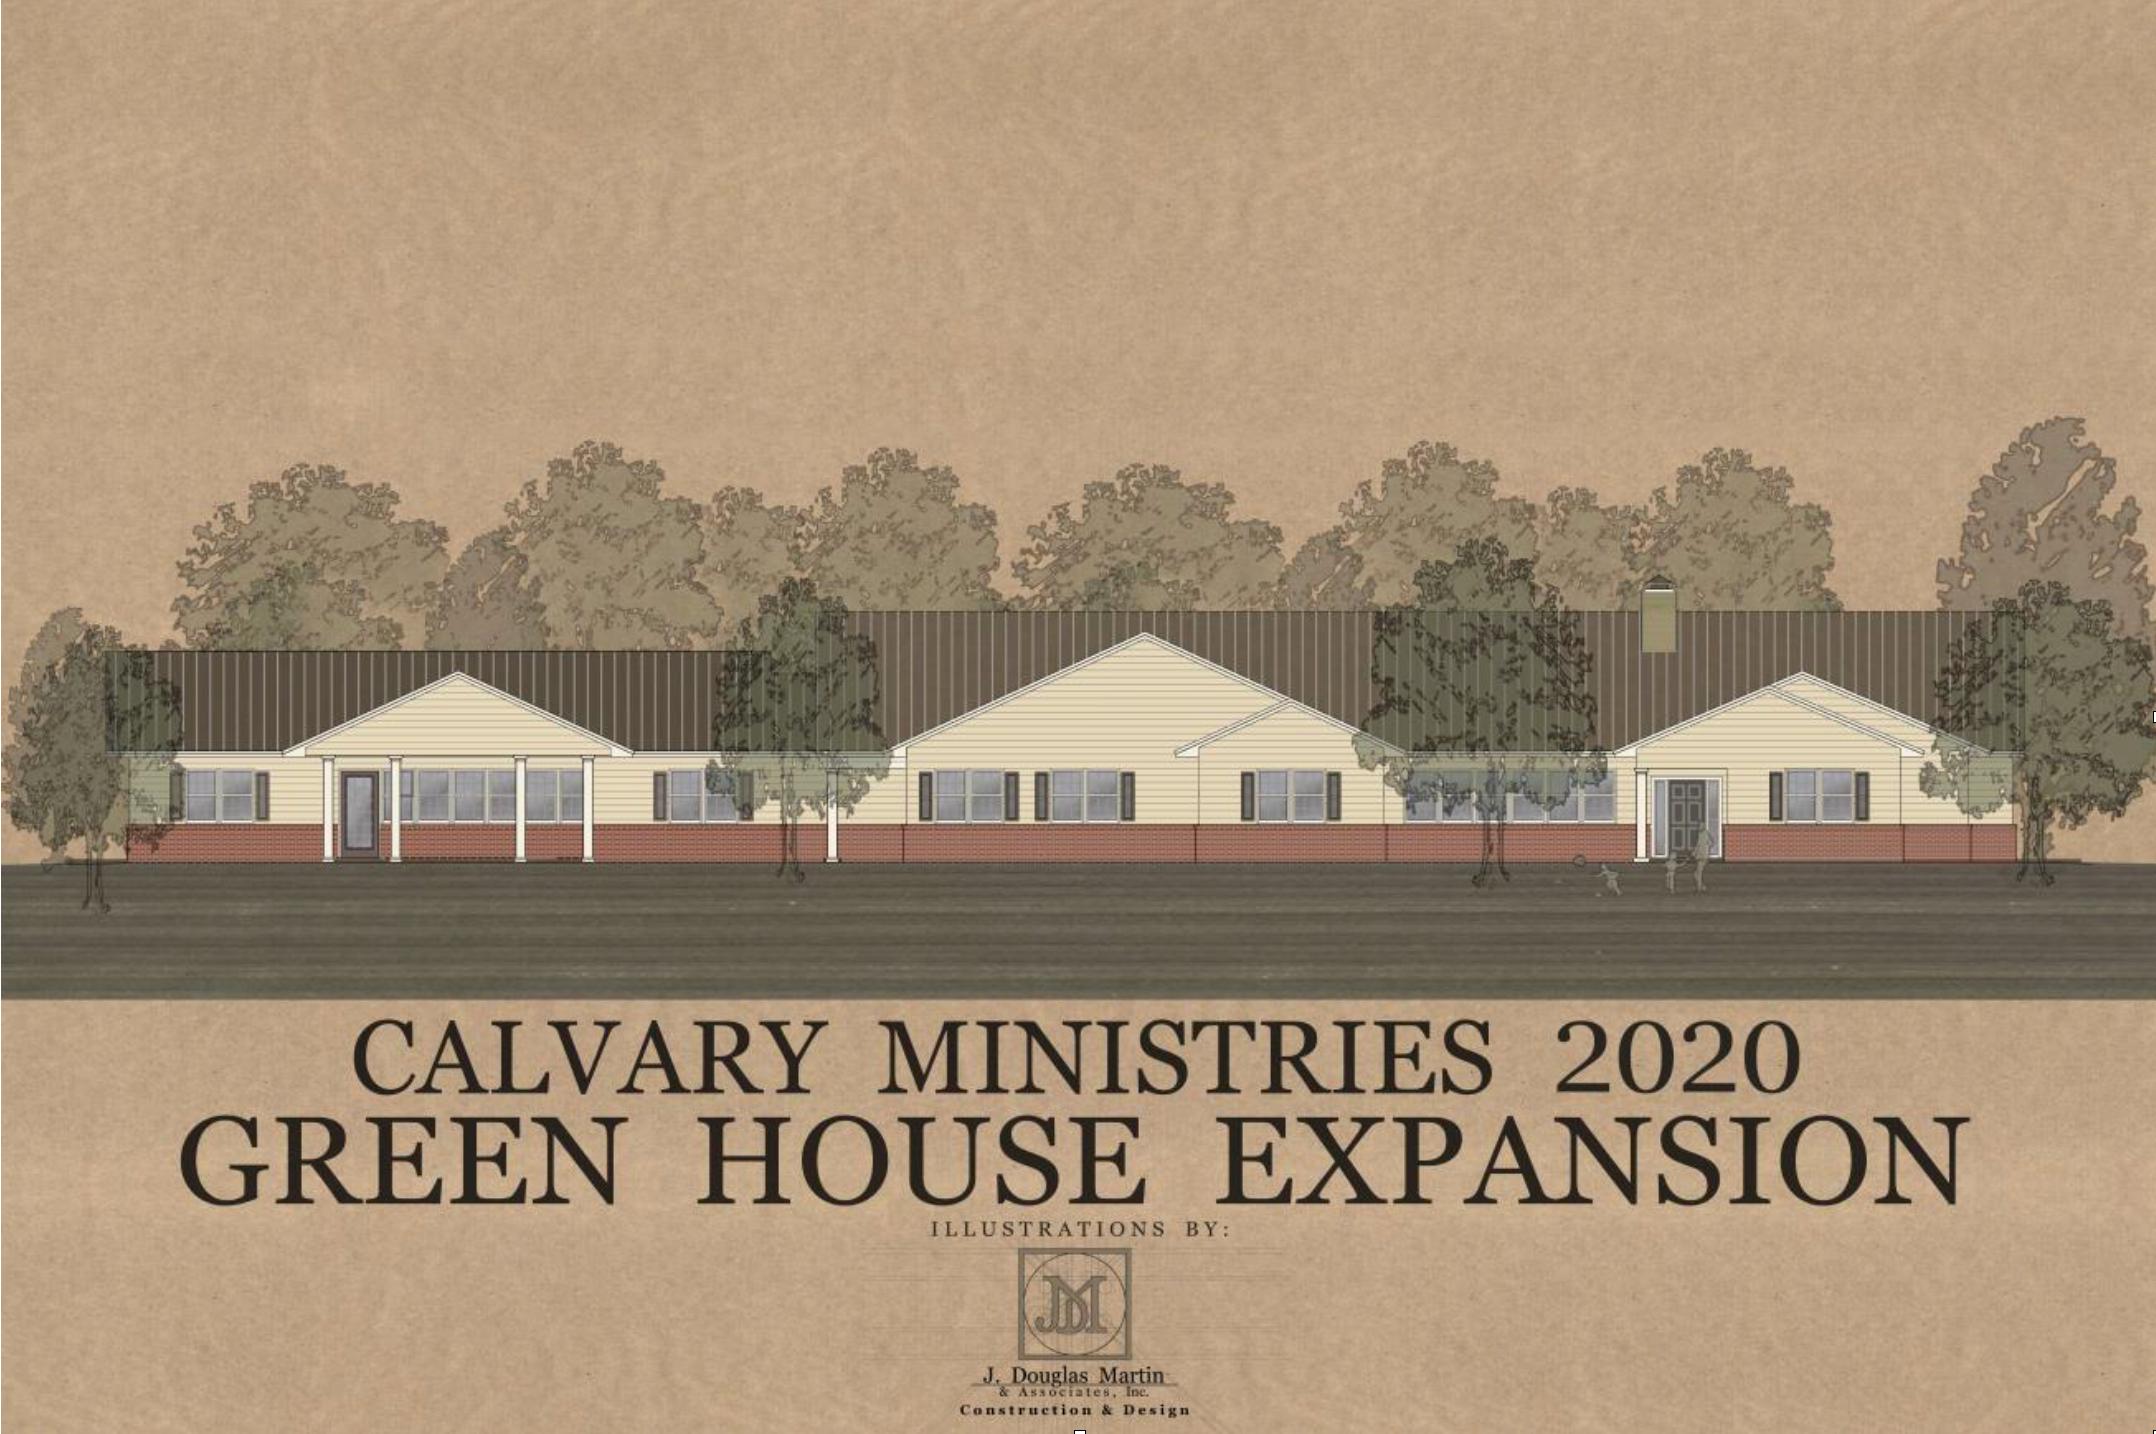 Greenhouserenovation